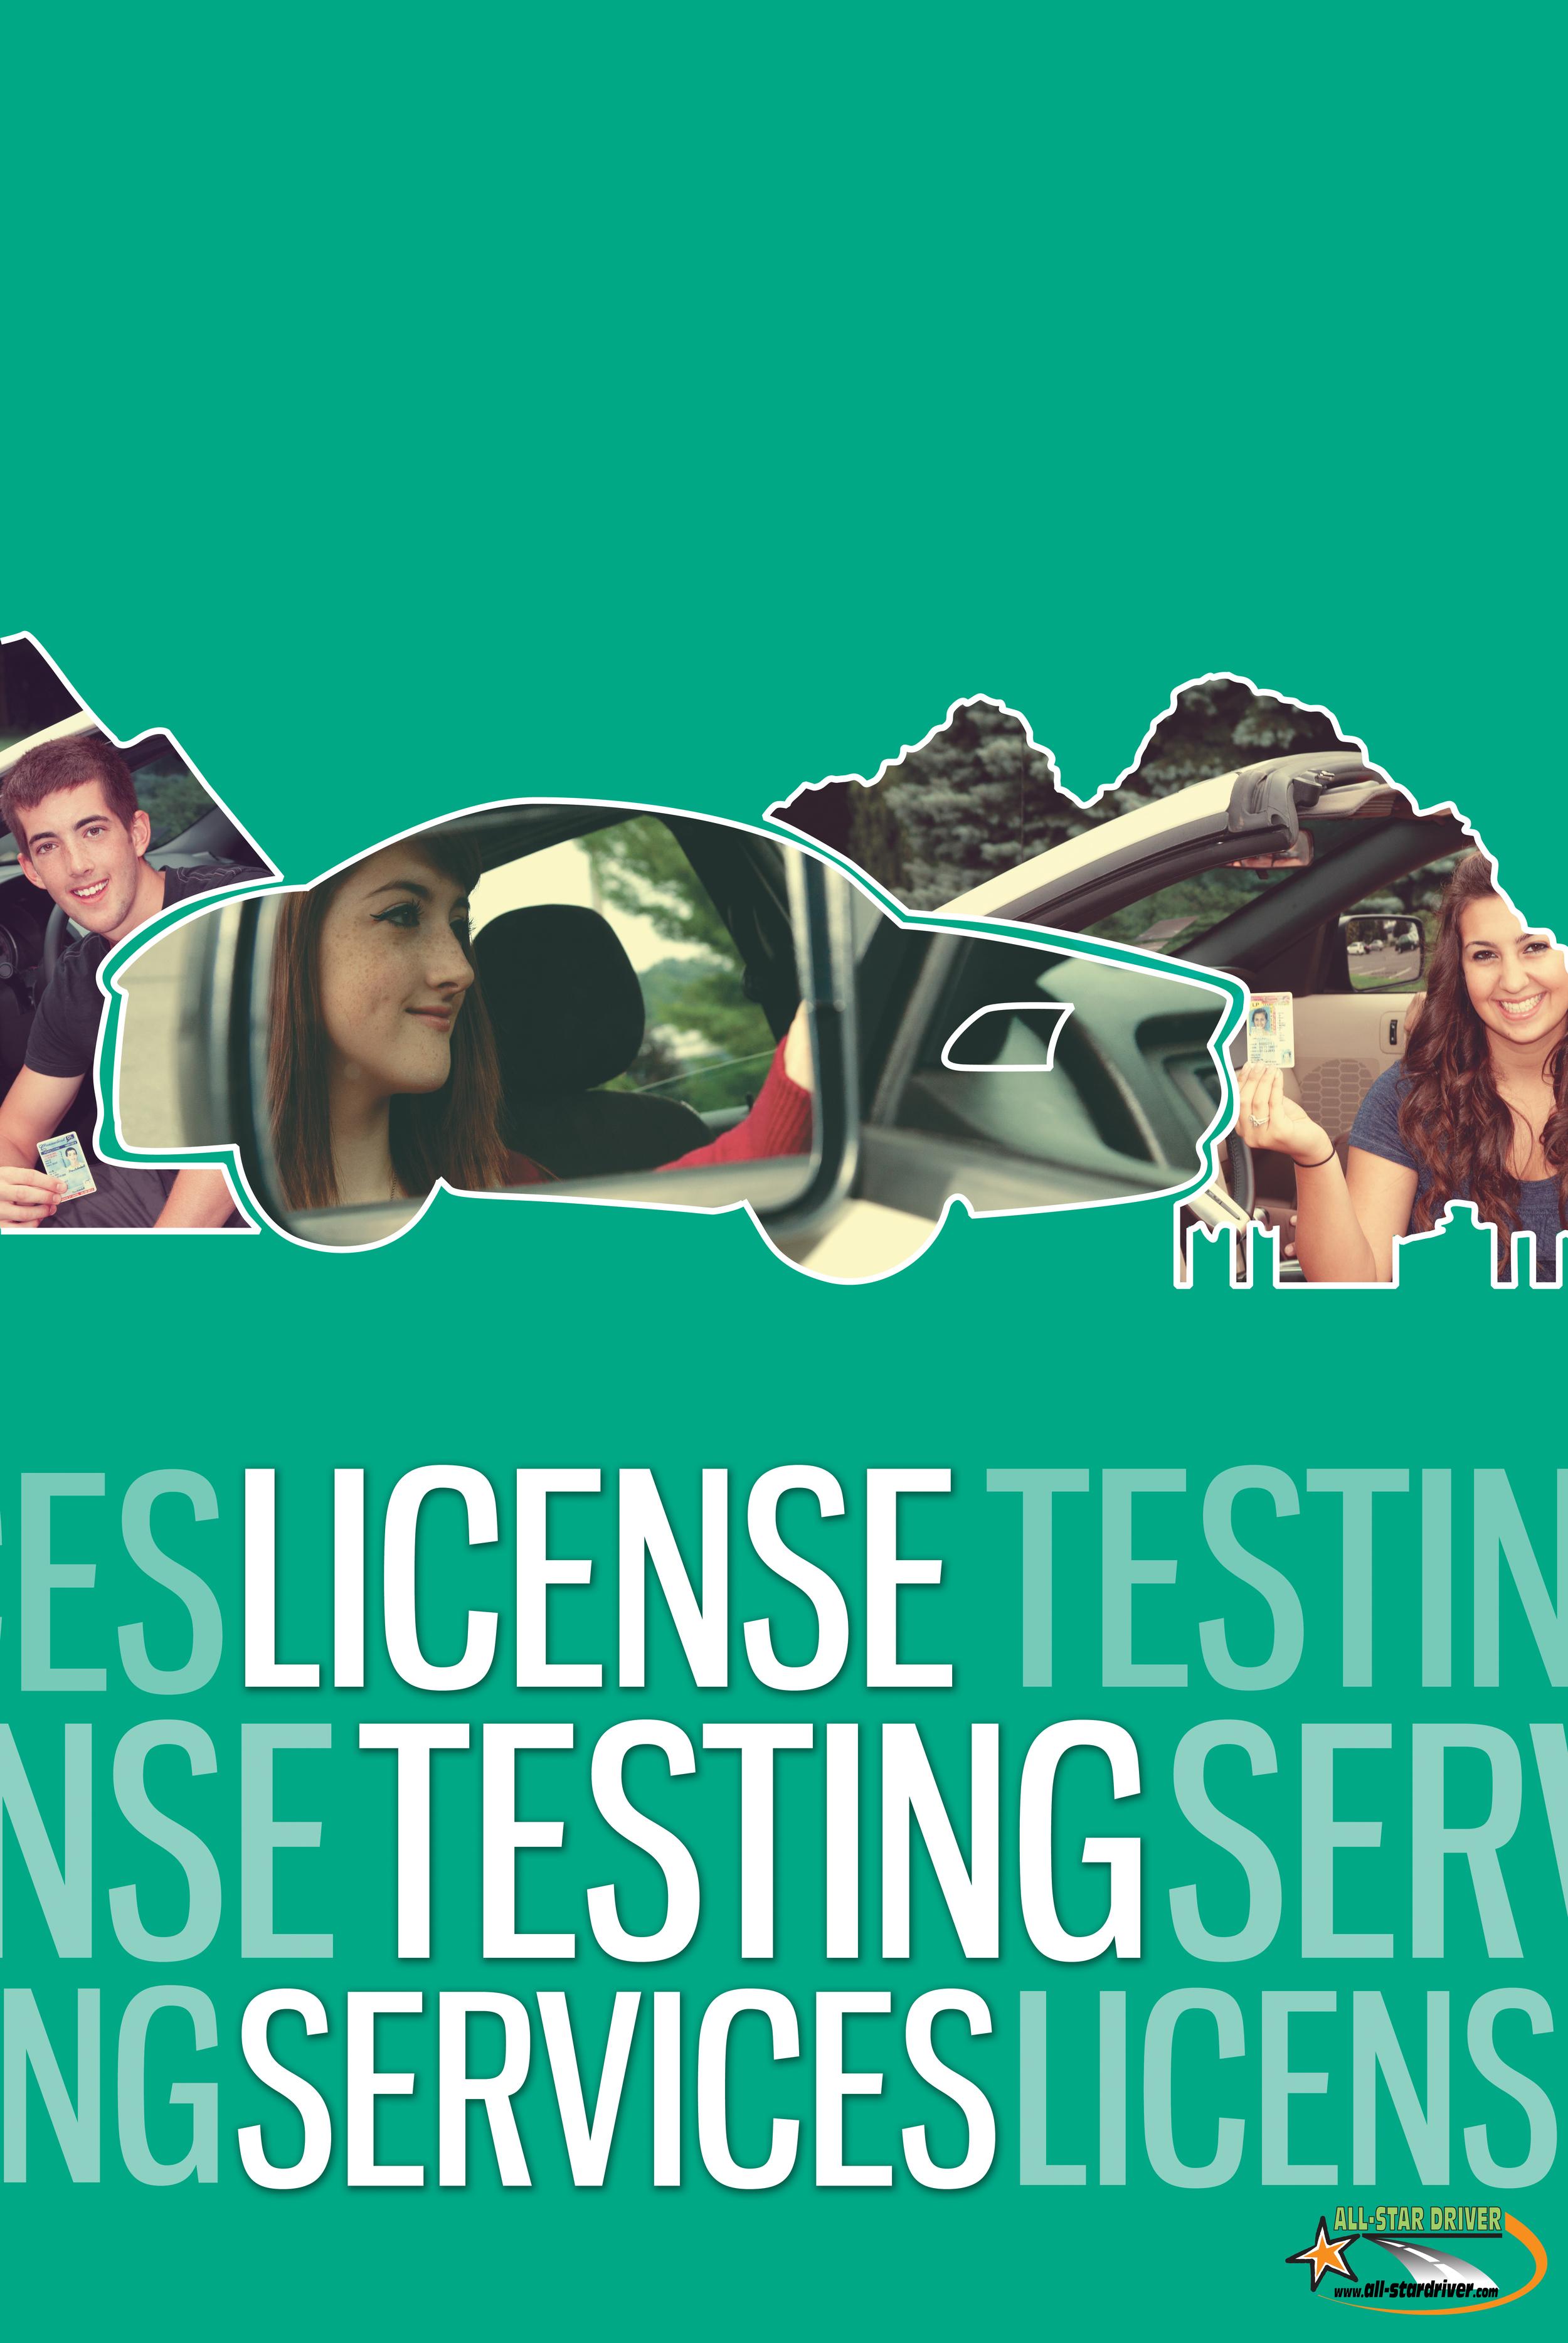 ASD Poster License Testing Services.jpg